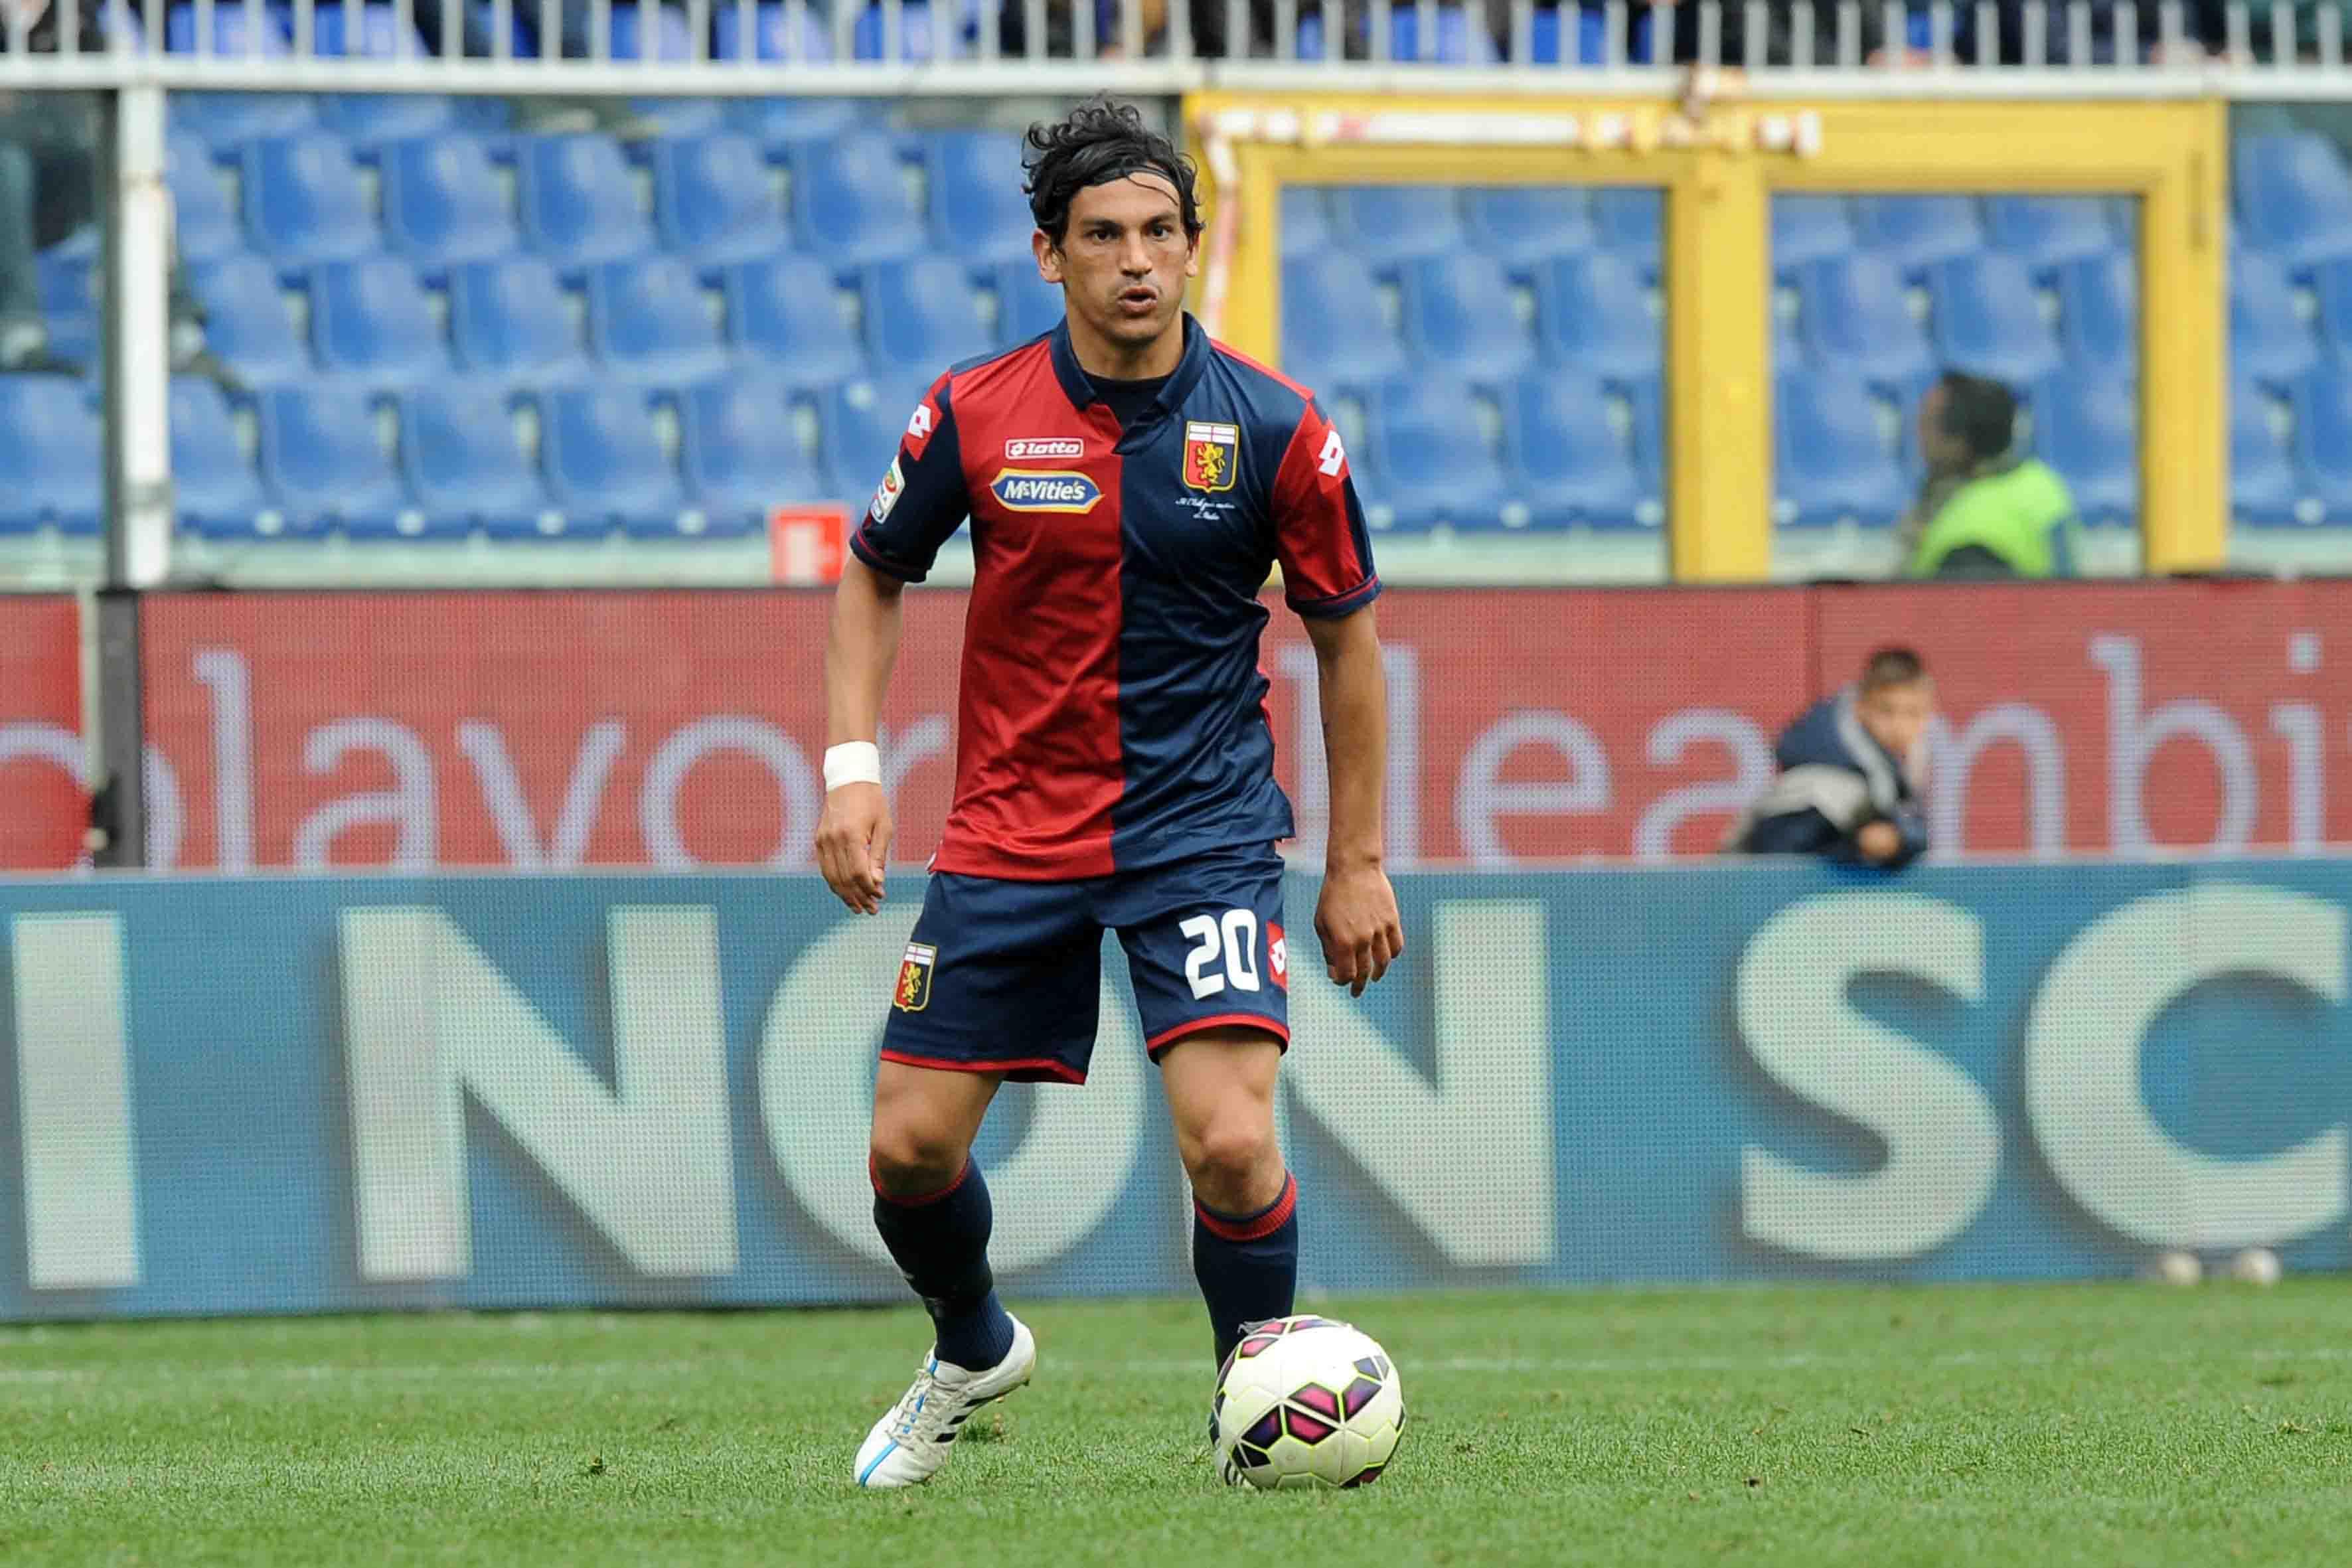 04 04 2015 Genoa - Udinese Campionato Serie A Tim 2014/2015